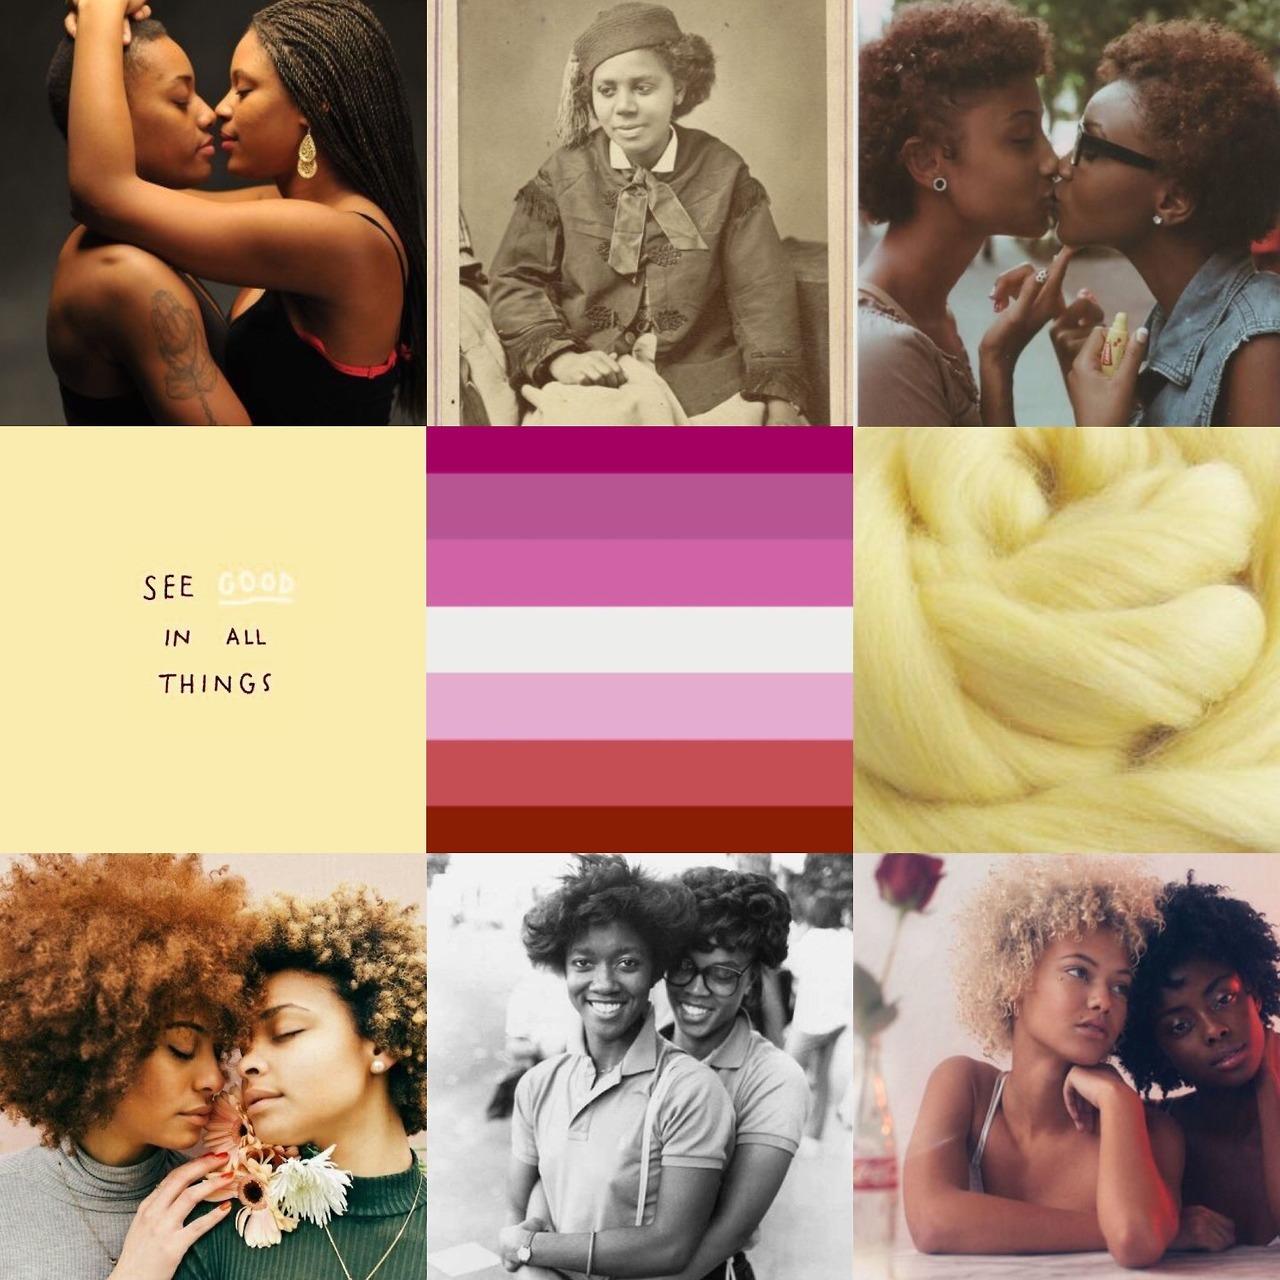 Black american lesbians